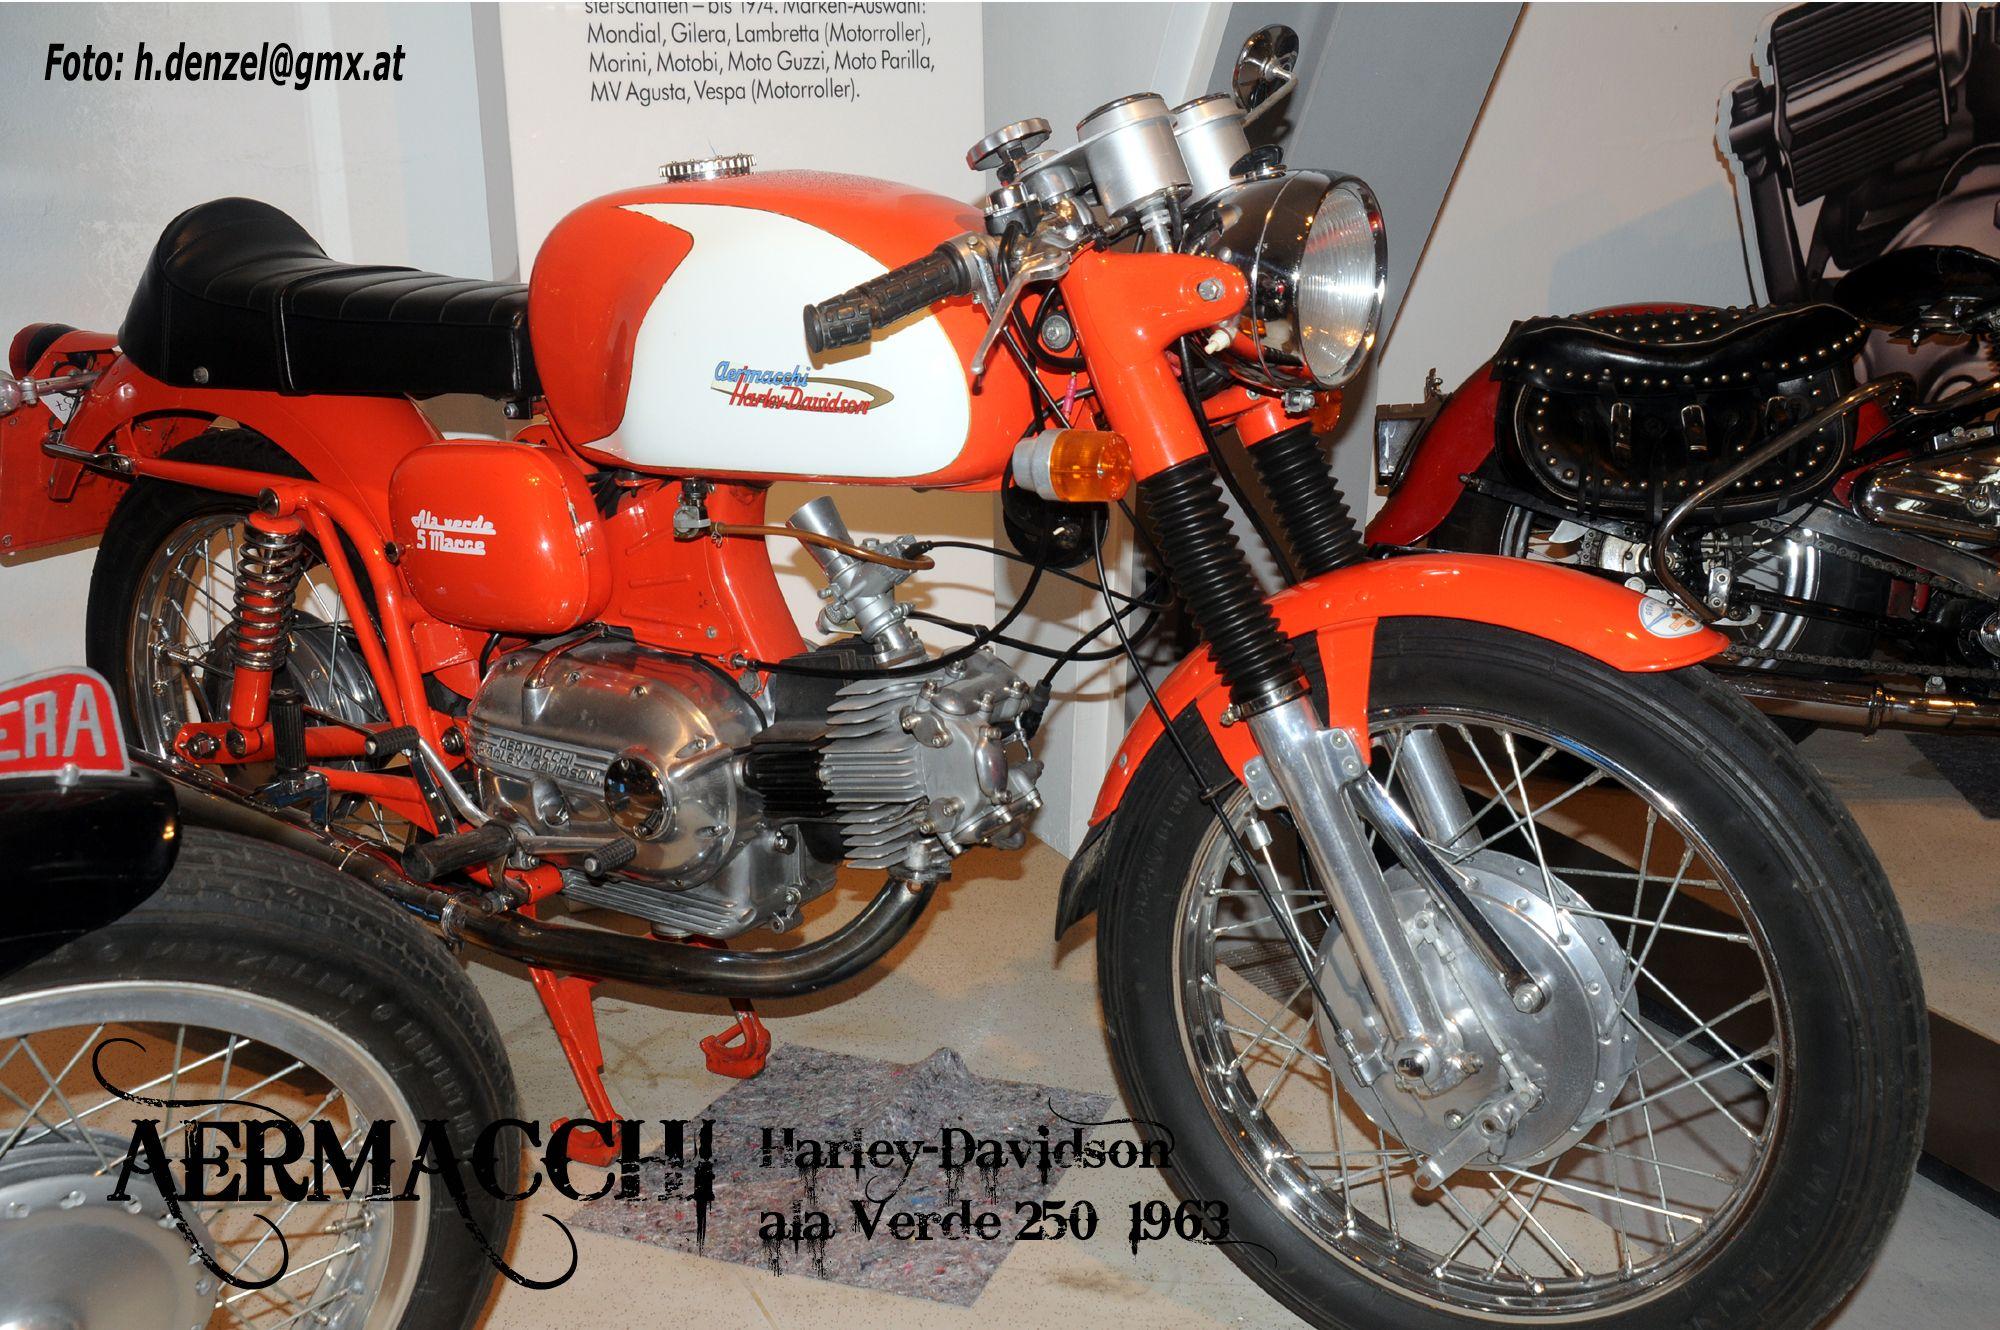 Aermacchi-Harley Davidson ala Verde 250 1963 | Aermacchi